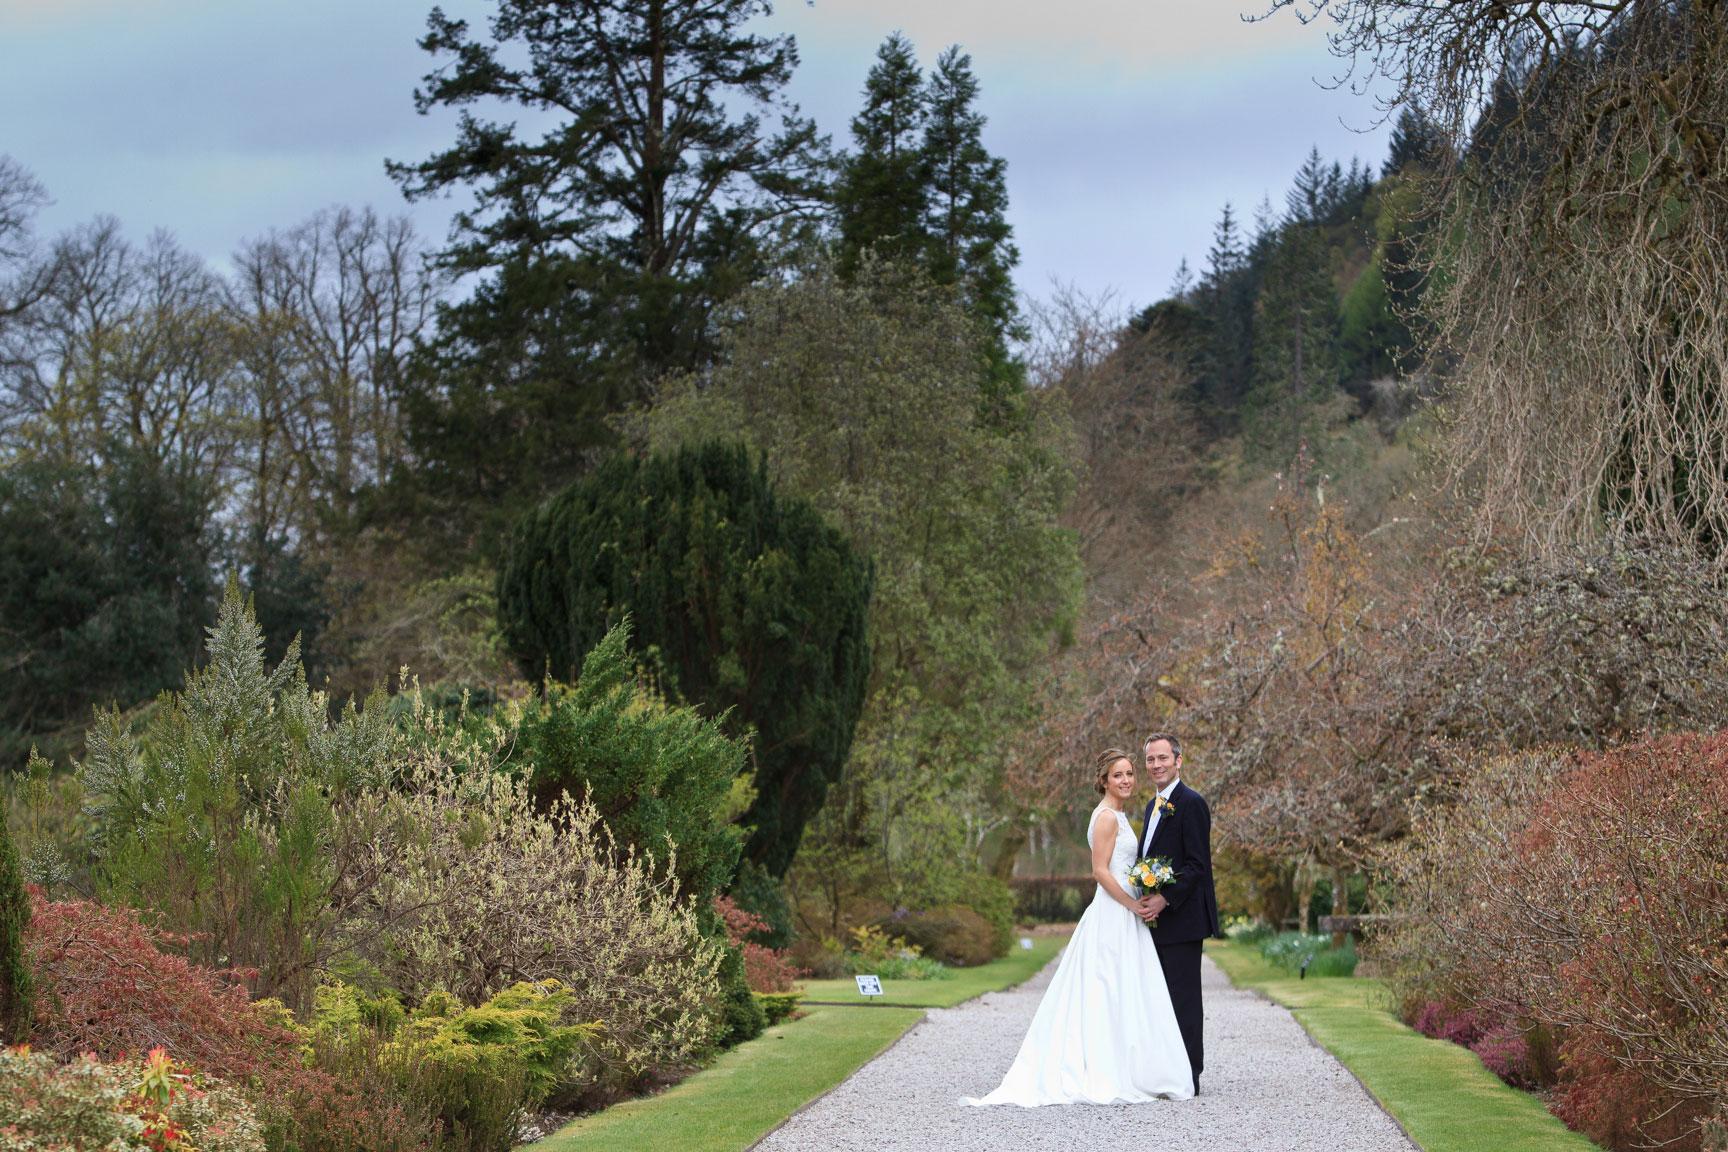 inveraray-castle-wedding-couple